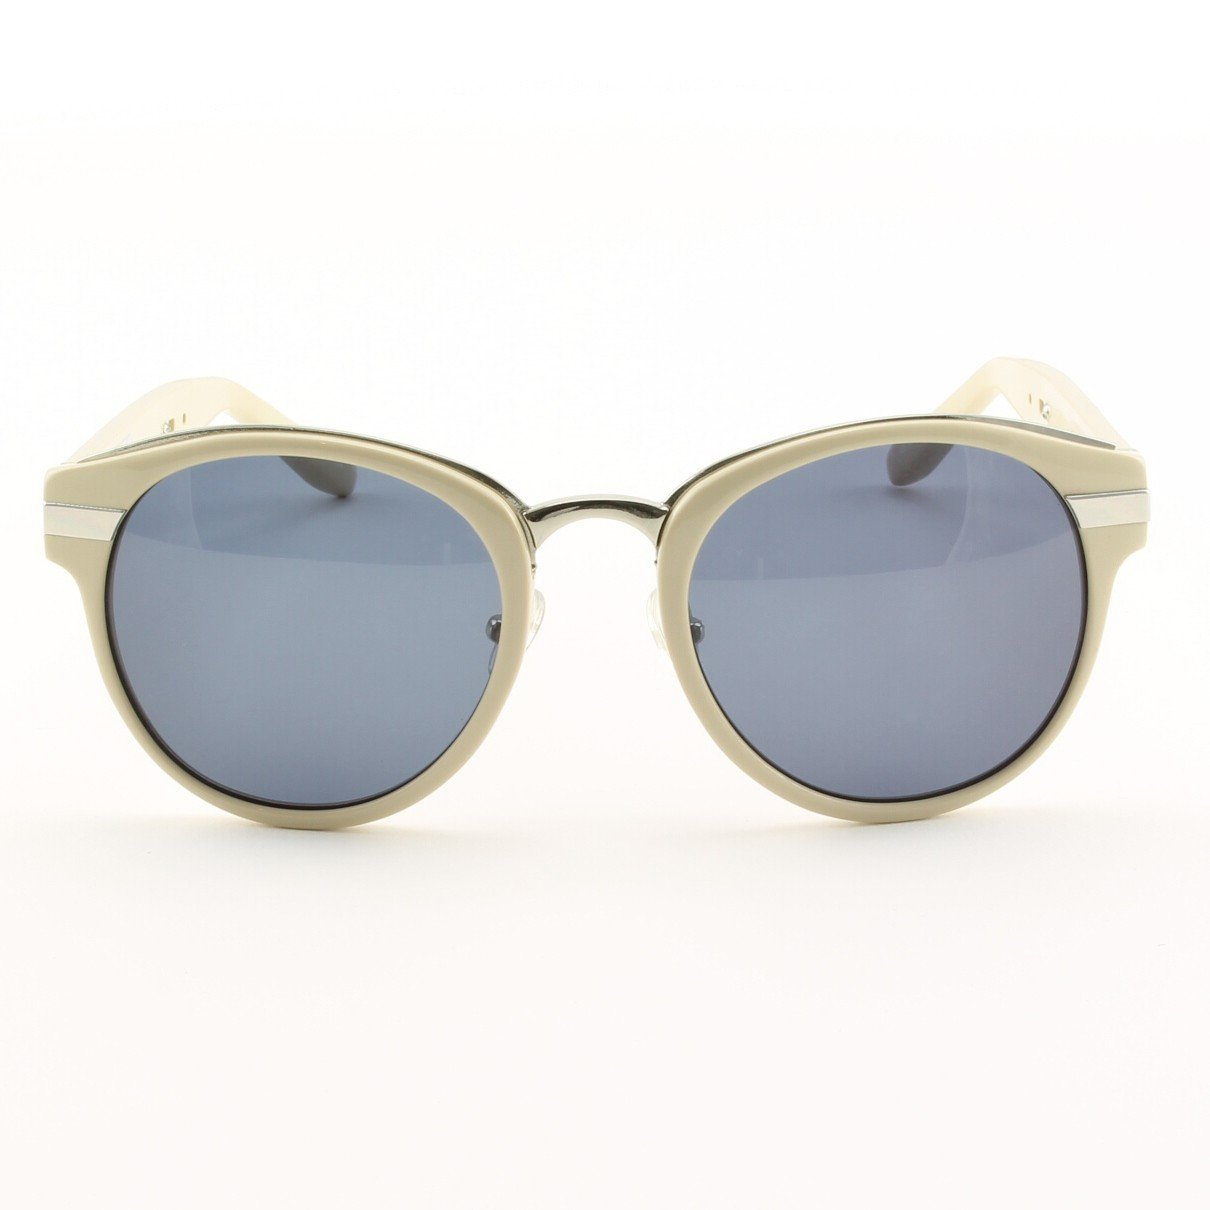 Alexander Wang x Linda Farrow 009 C. 3 Sunglasses in Cream Stripe w/ Blue Lenses